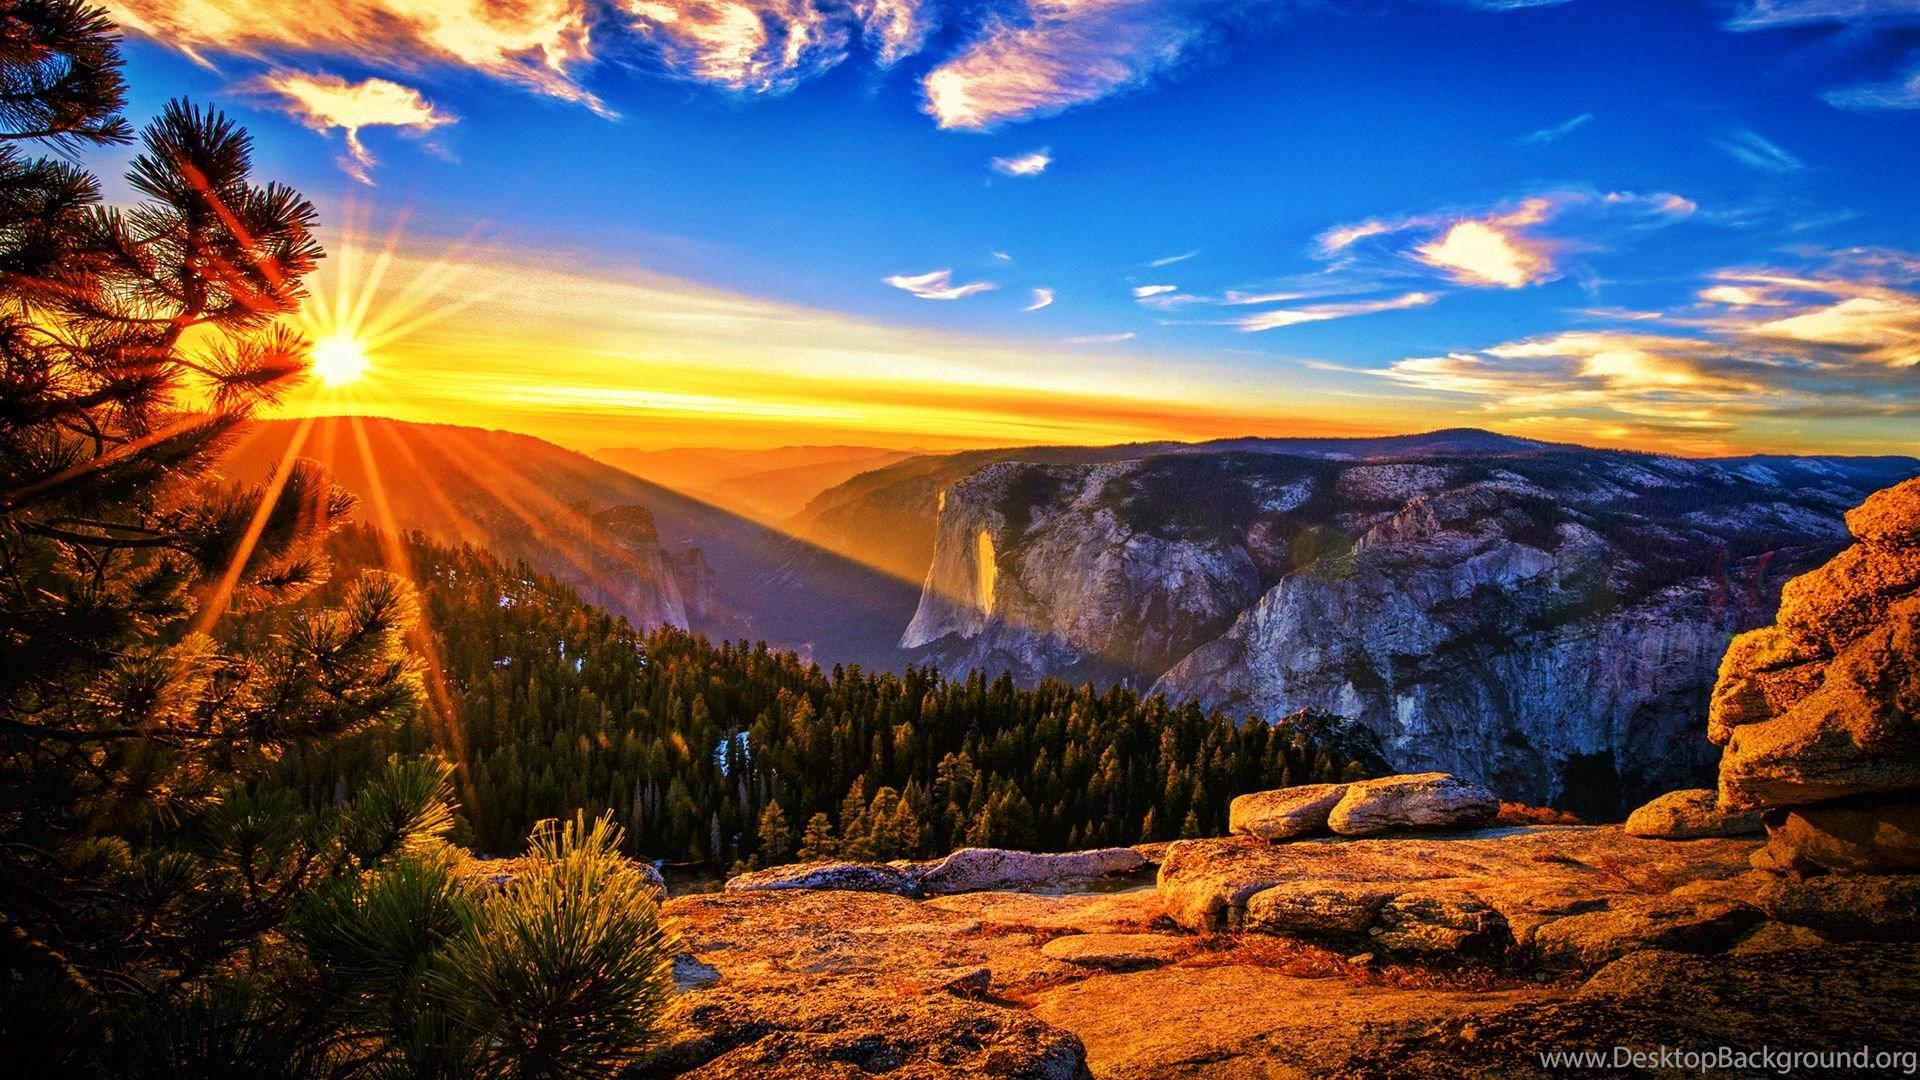 HD Beautiful Sunrise In The Mountain Wallpapers 1080p